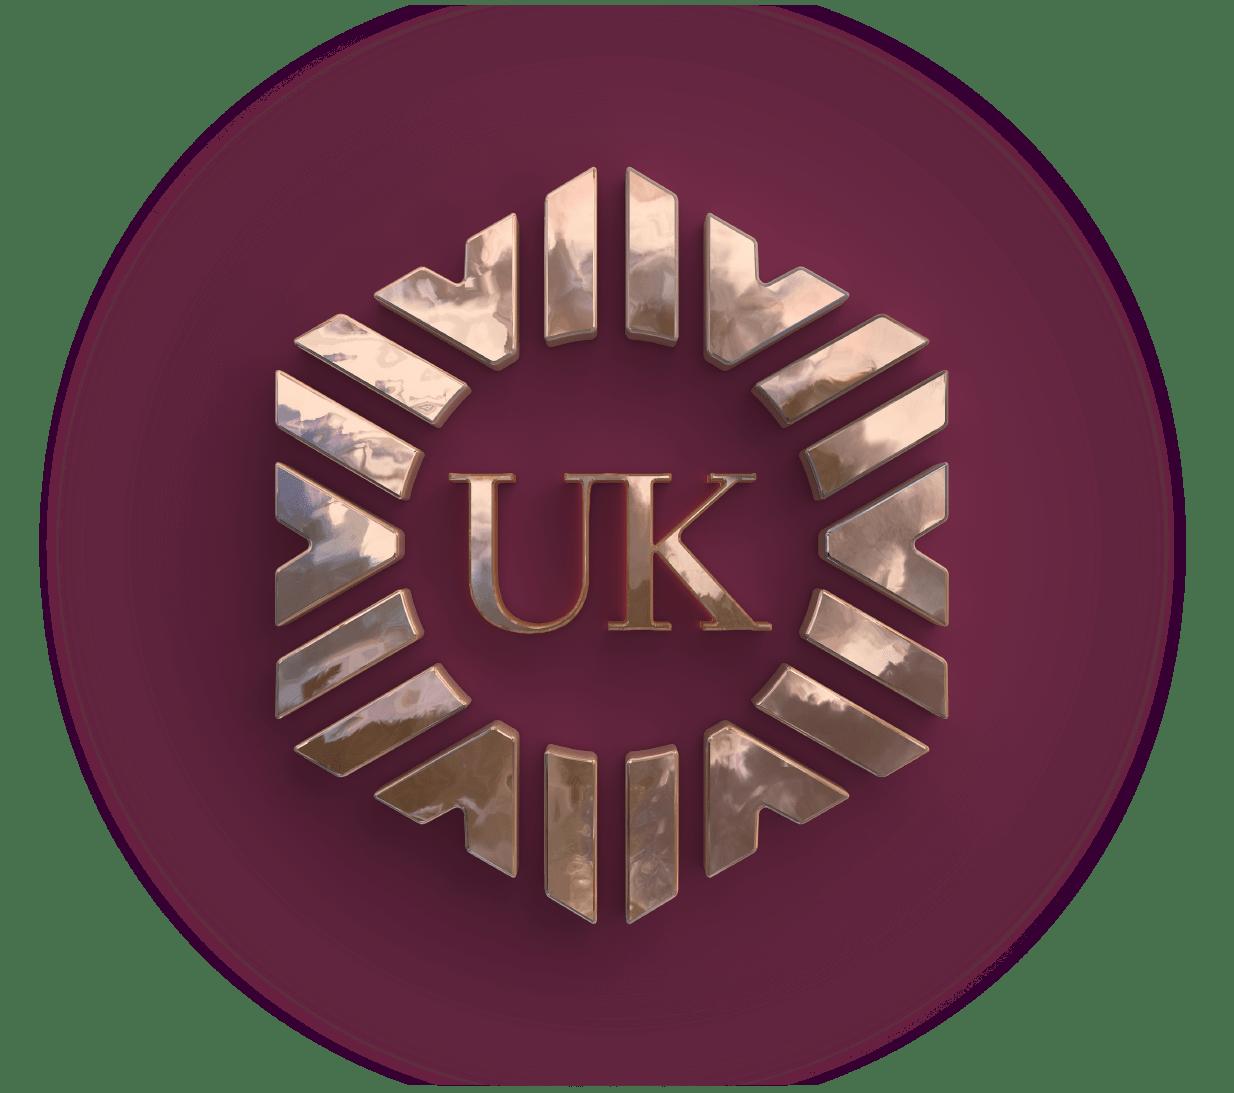 United Kingsway Condos